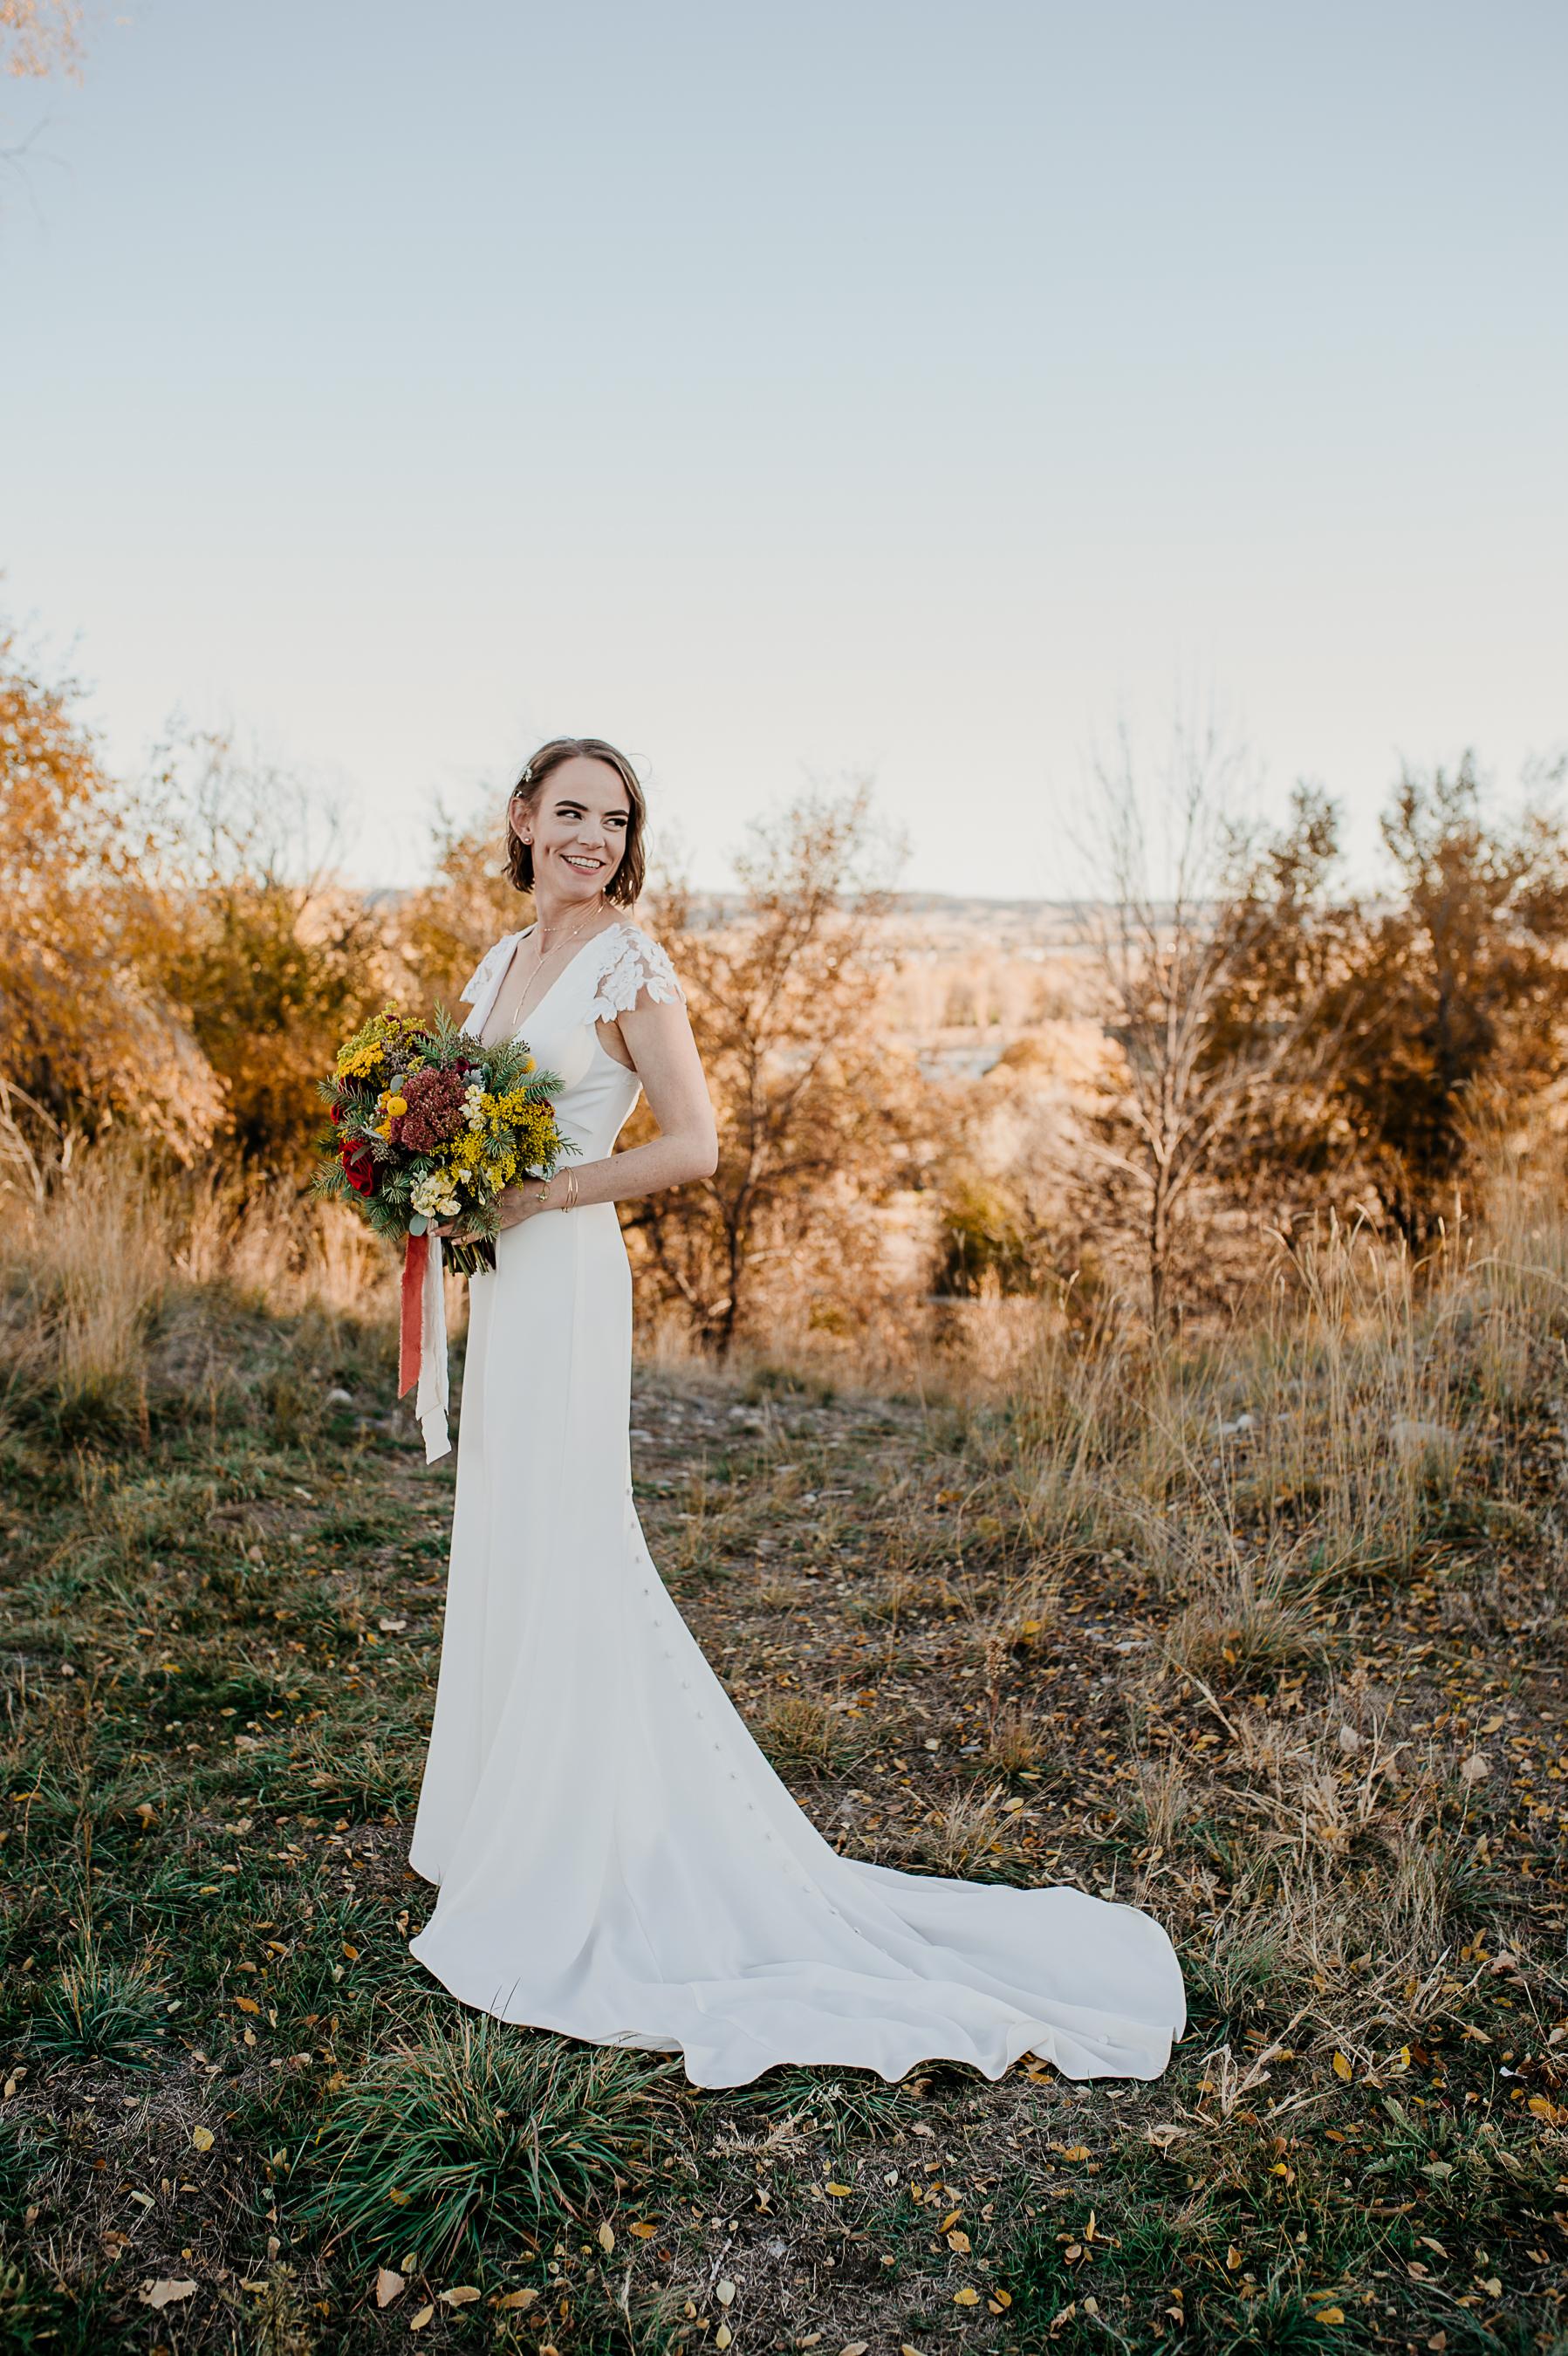 1005Fall Wedding_Maroon Wedding_Billings Wedding Photographer_Emma + Dan_October 20, 2018-4079.jpg